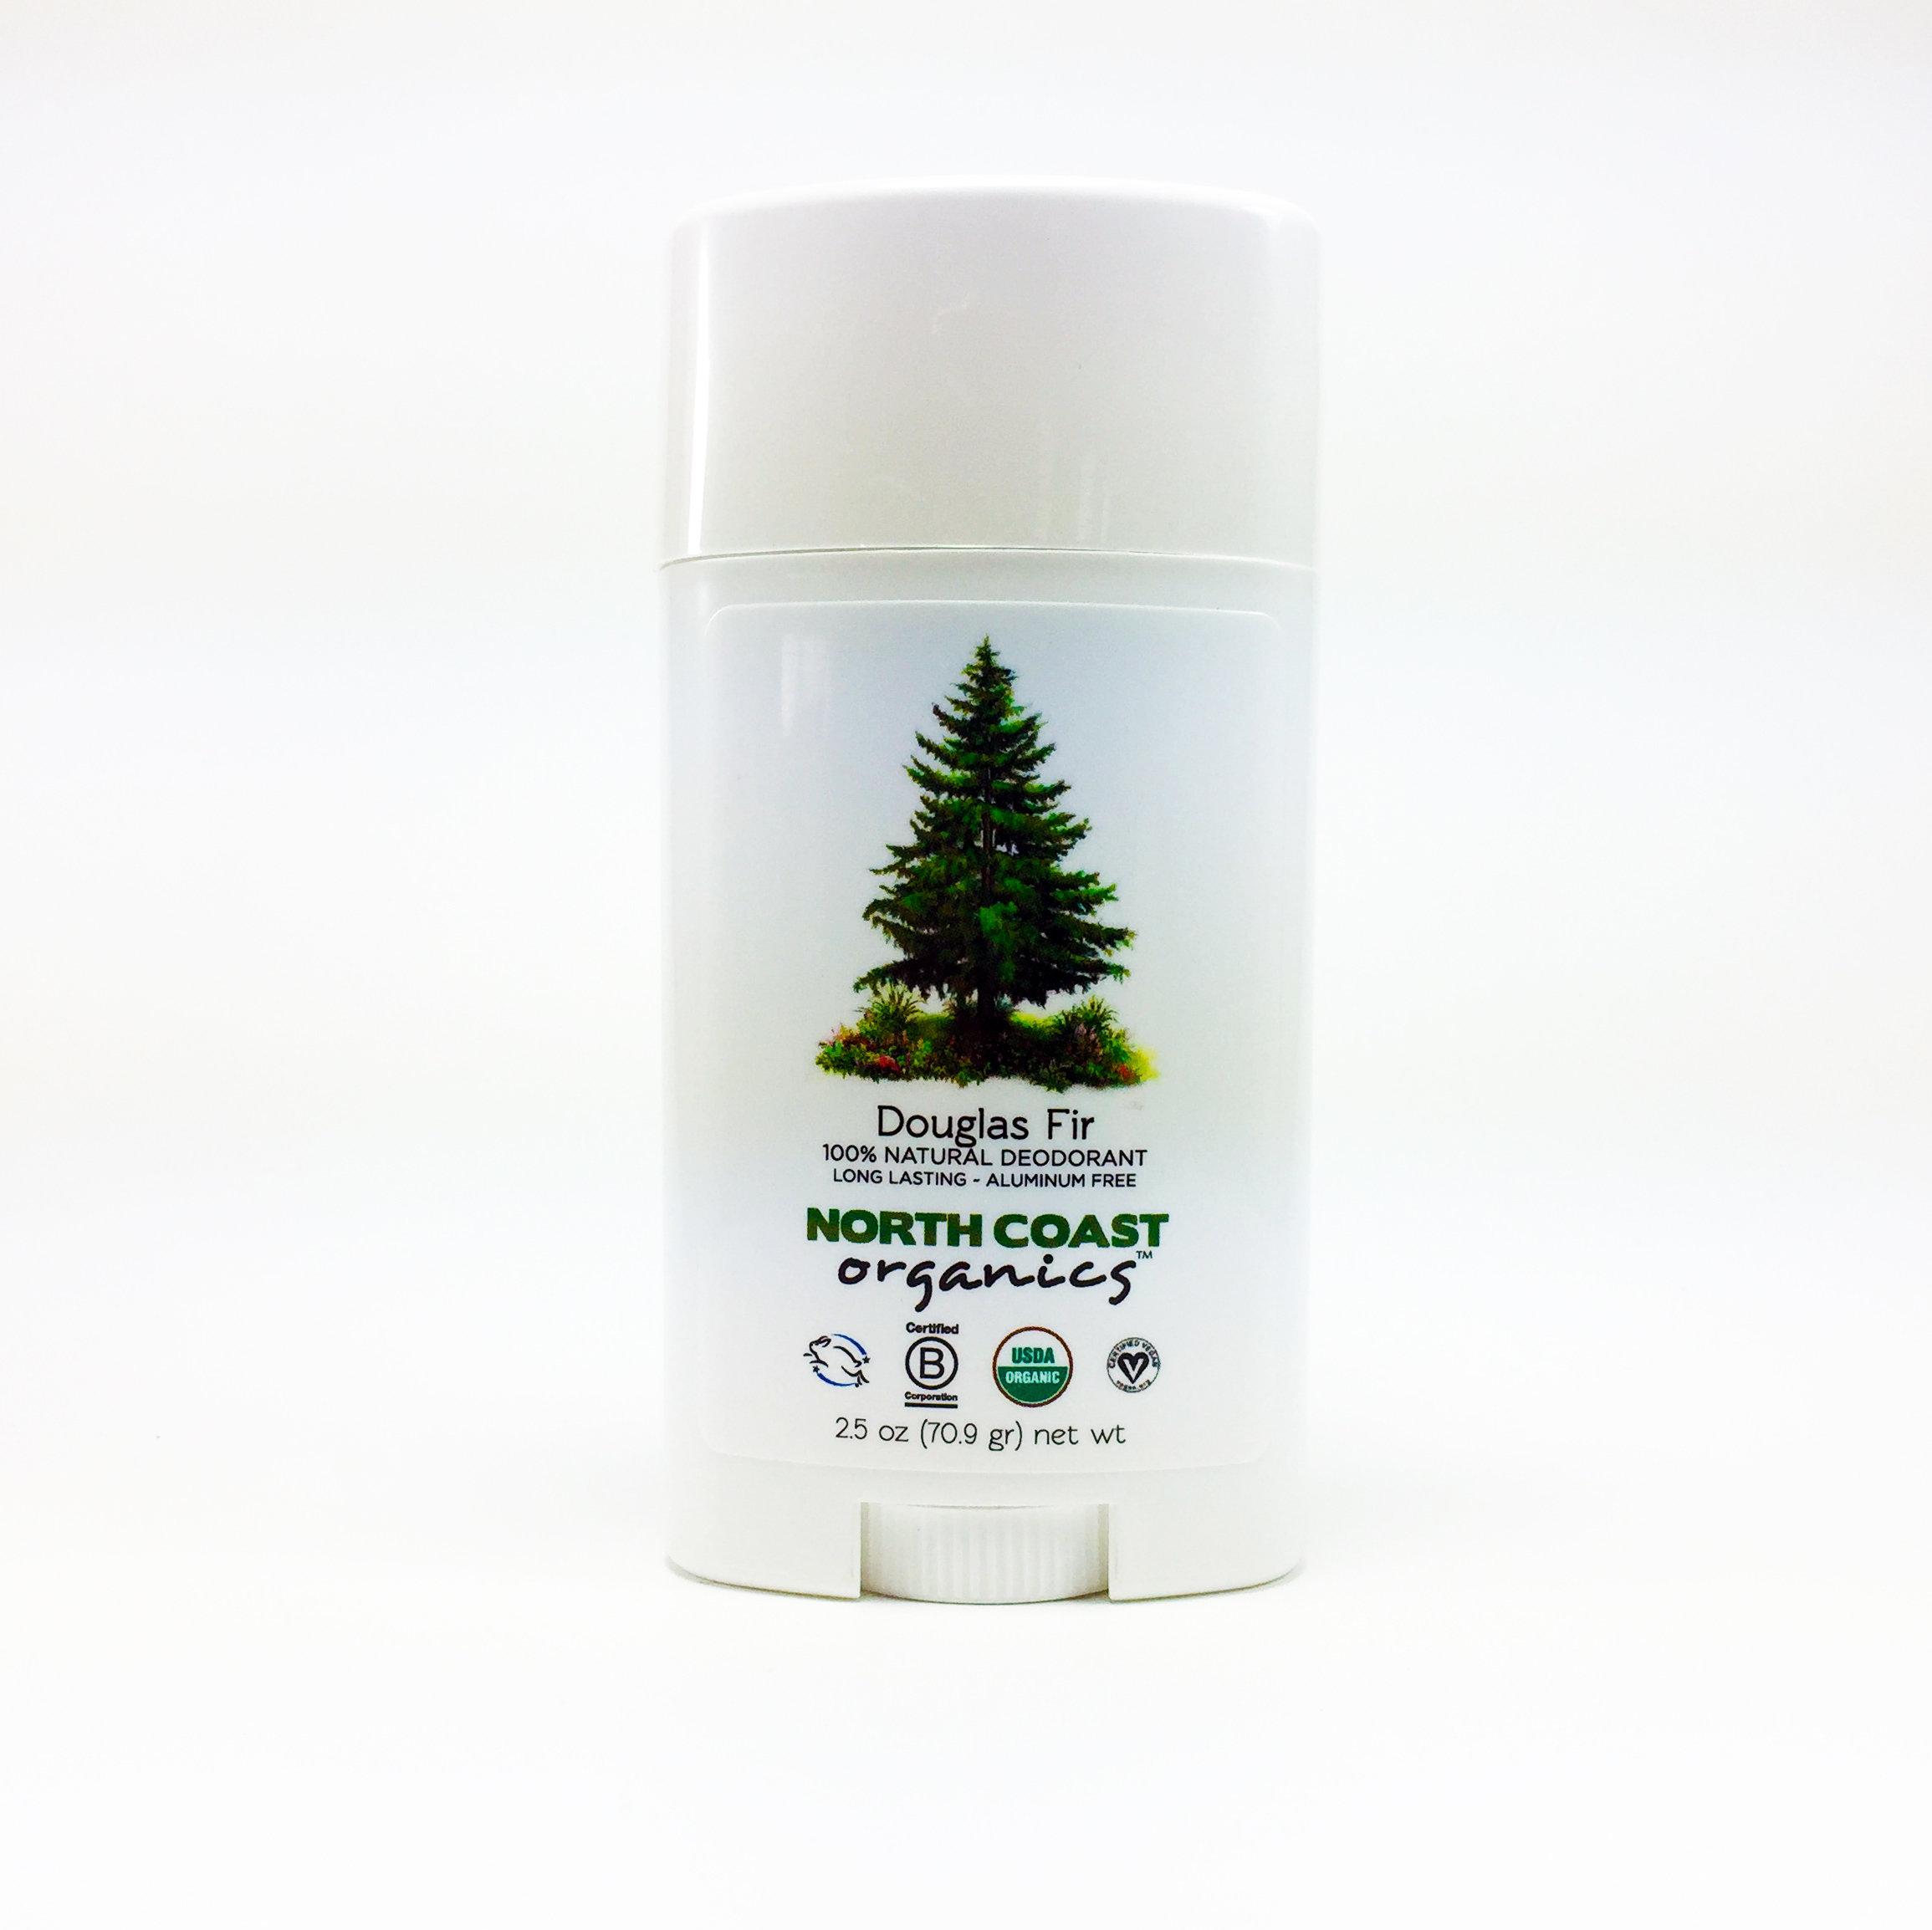 Douglas Fir - Organic Deodorant 2.5oz 1007